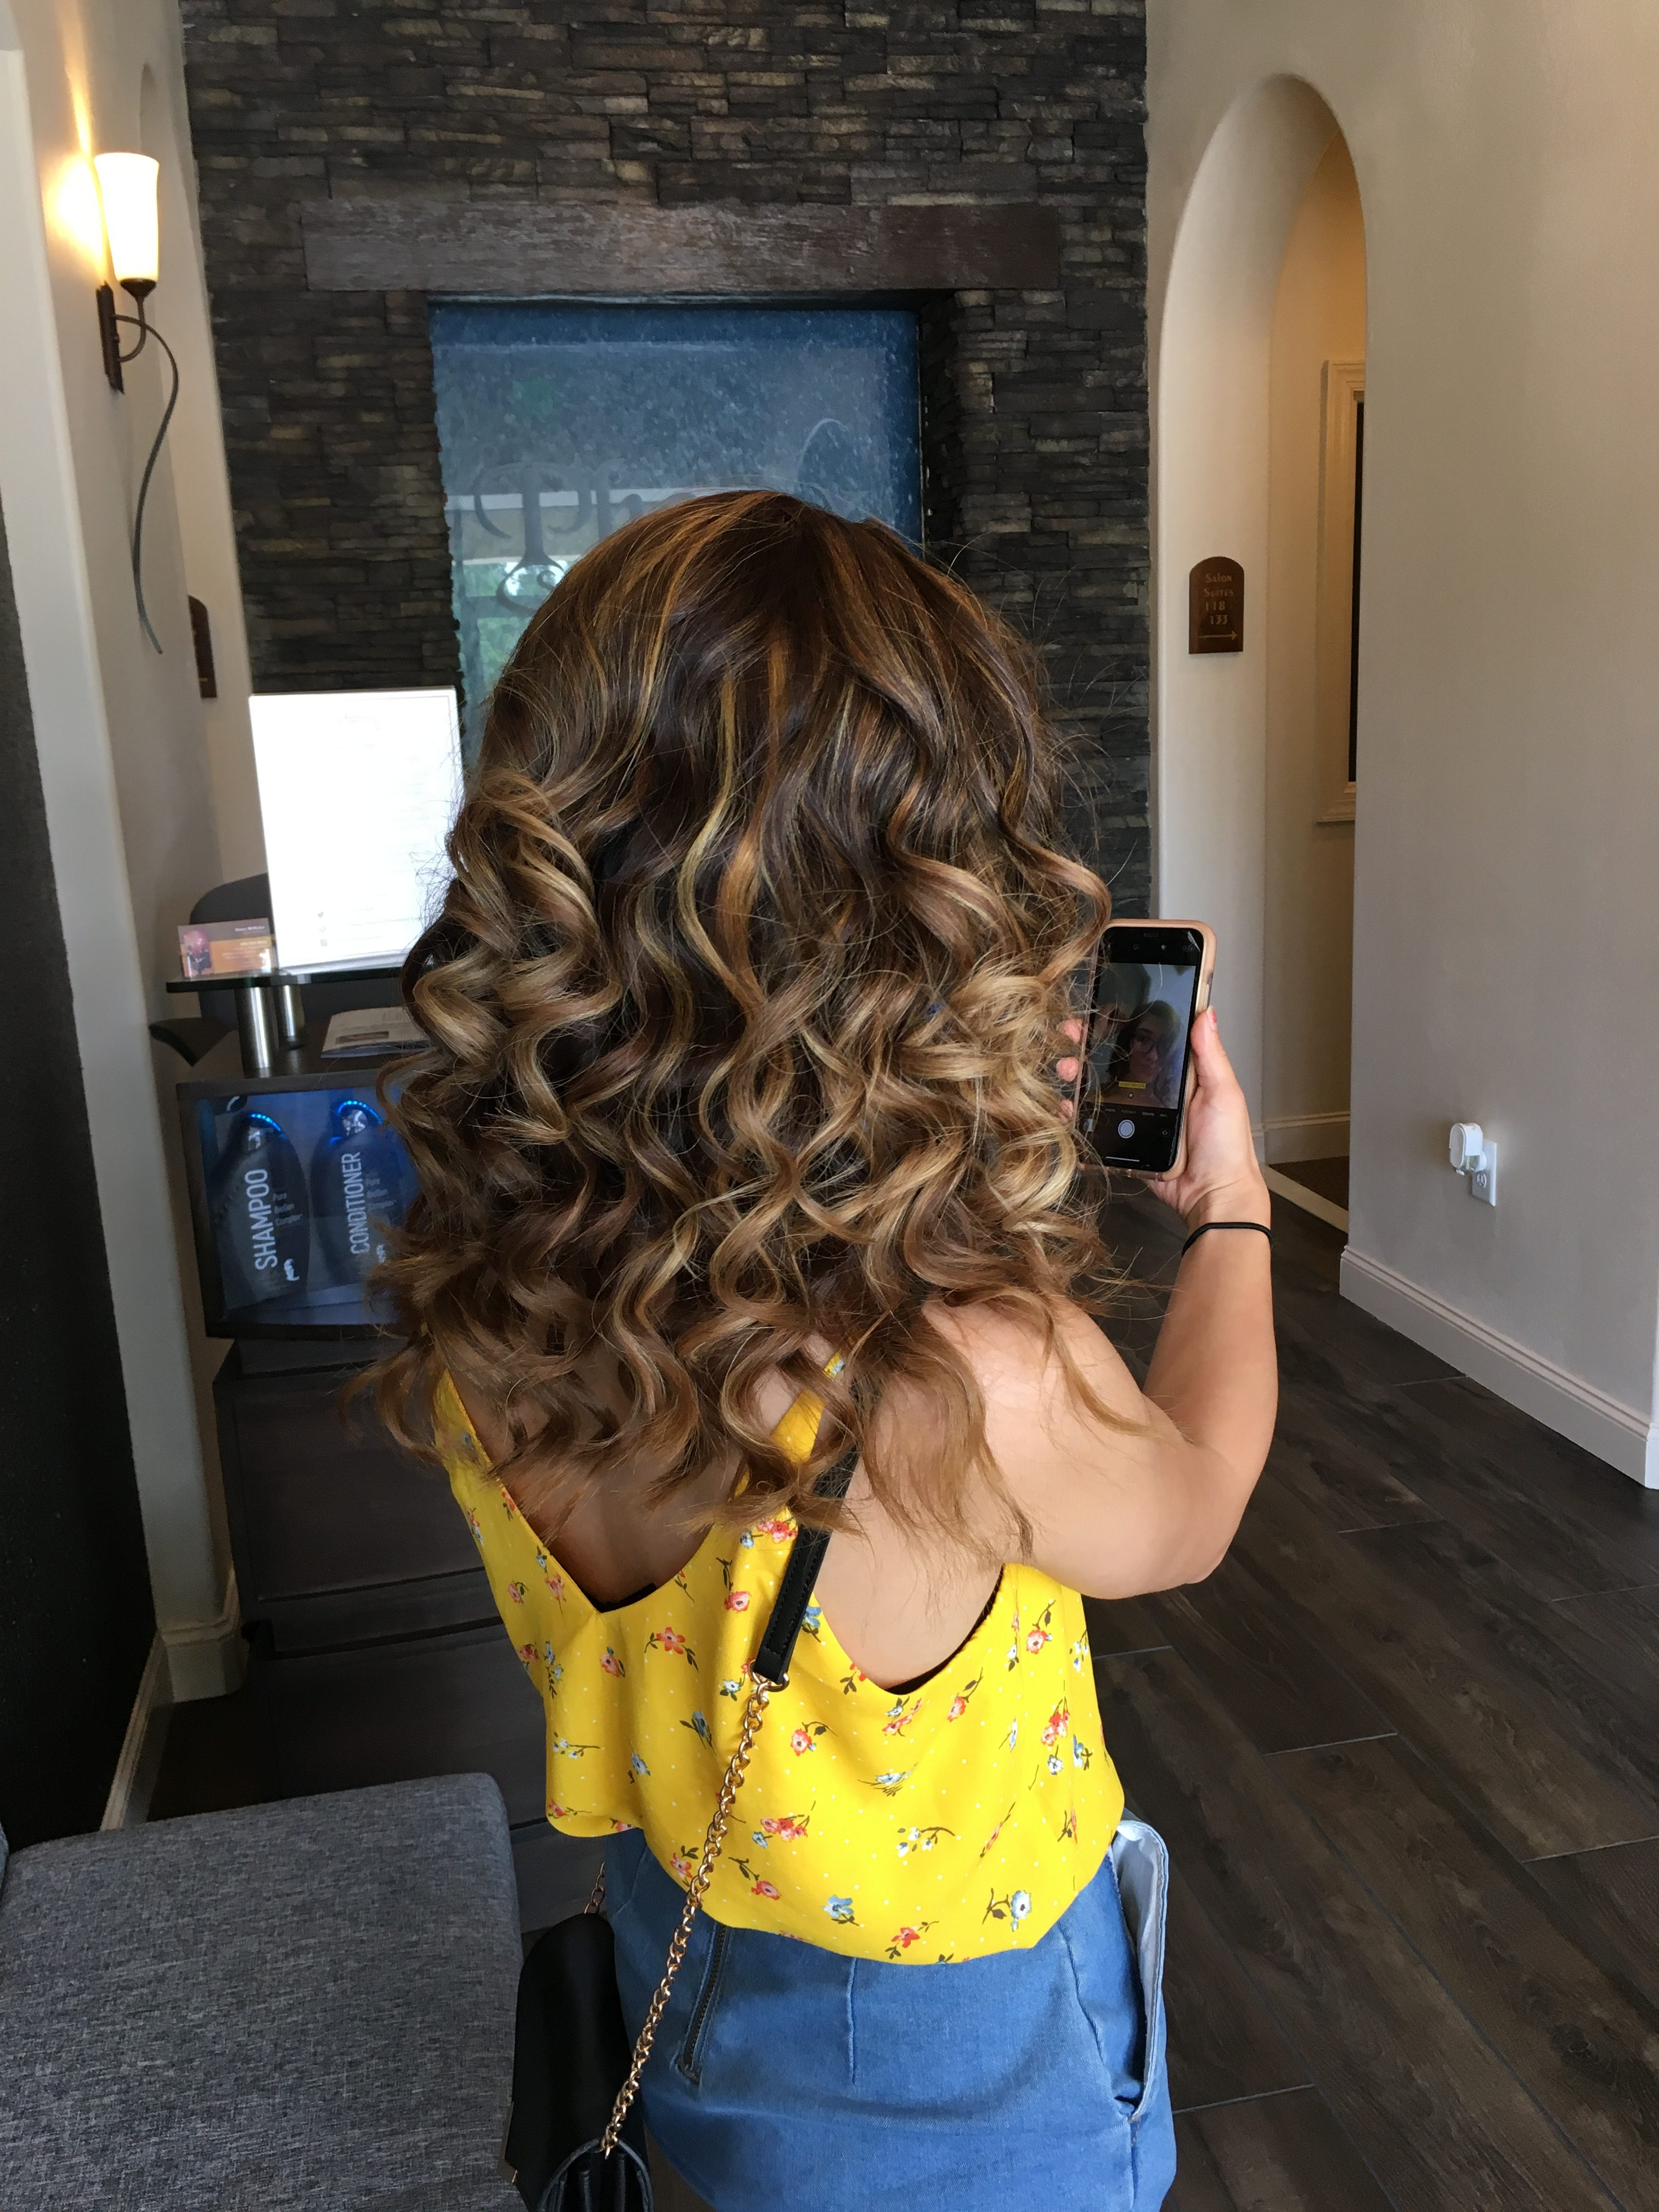 The Hair Goddess Salon